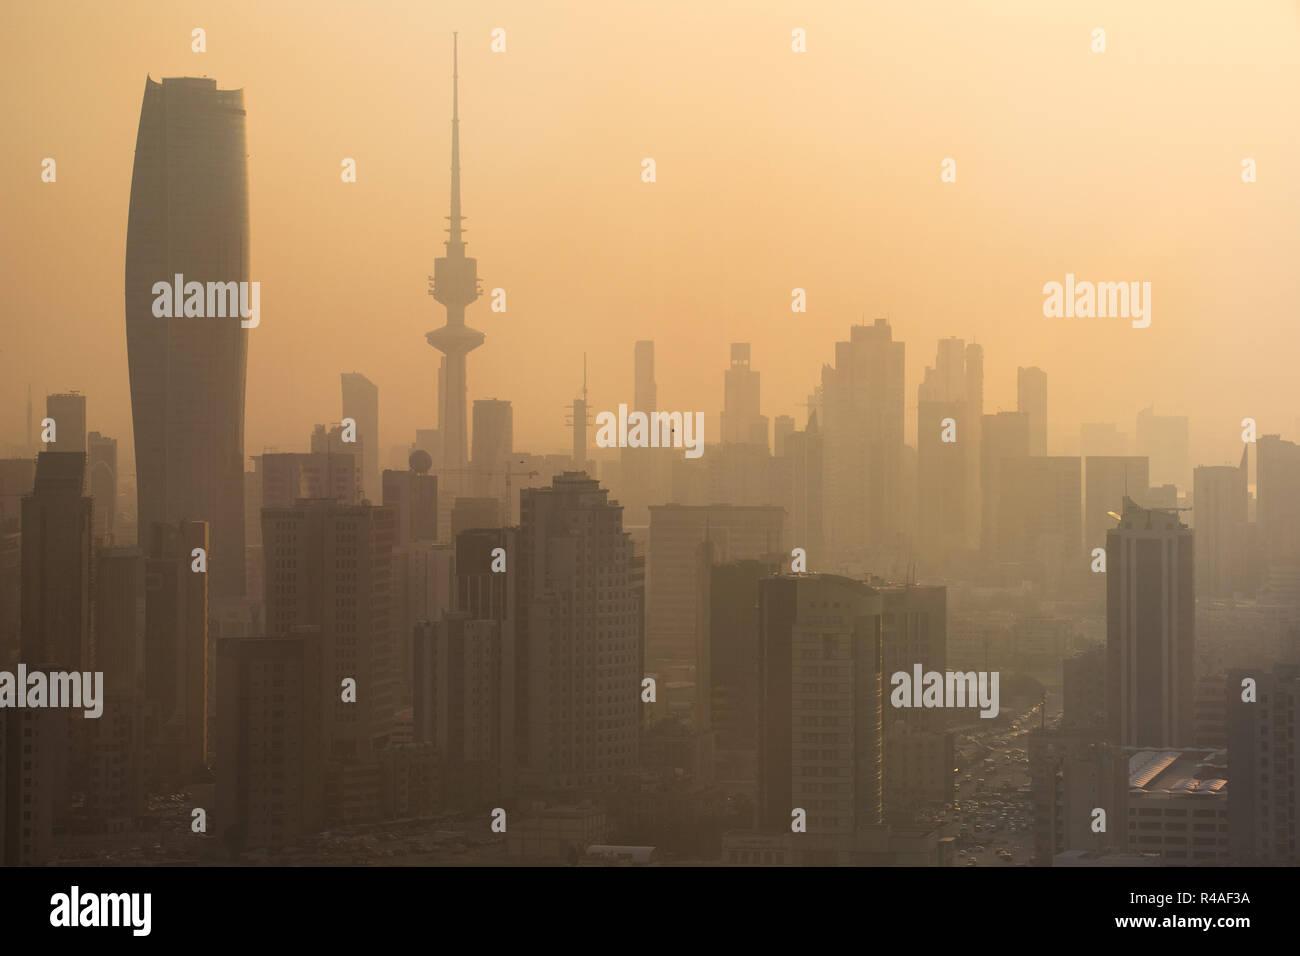 Kuwait City, Kuwait - Stock Image